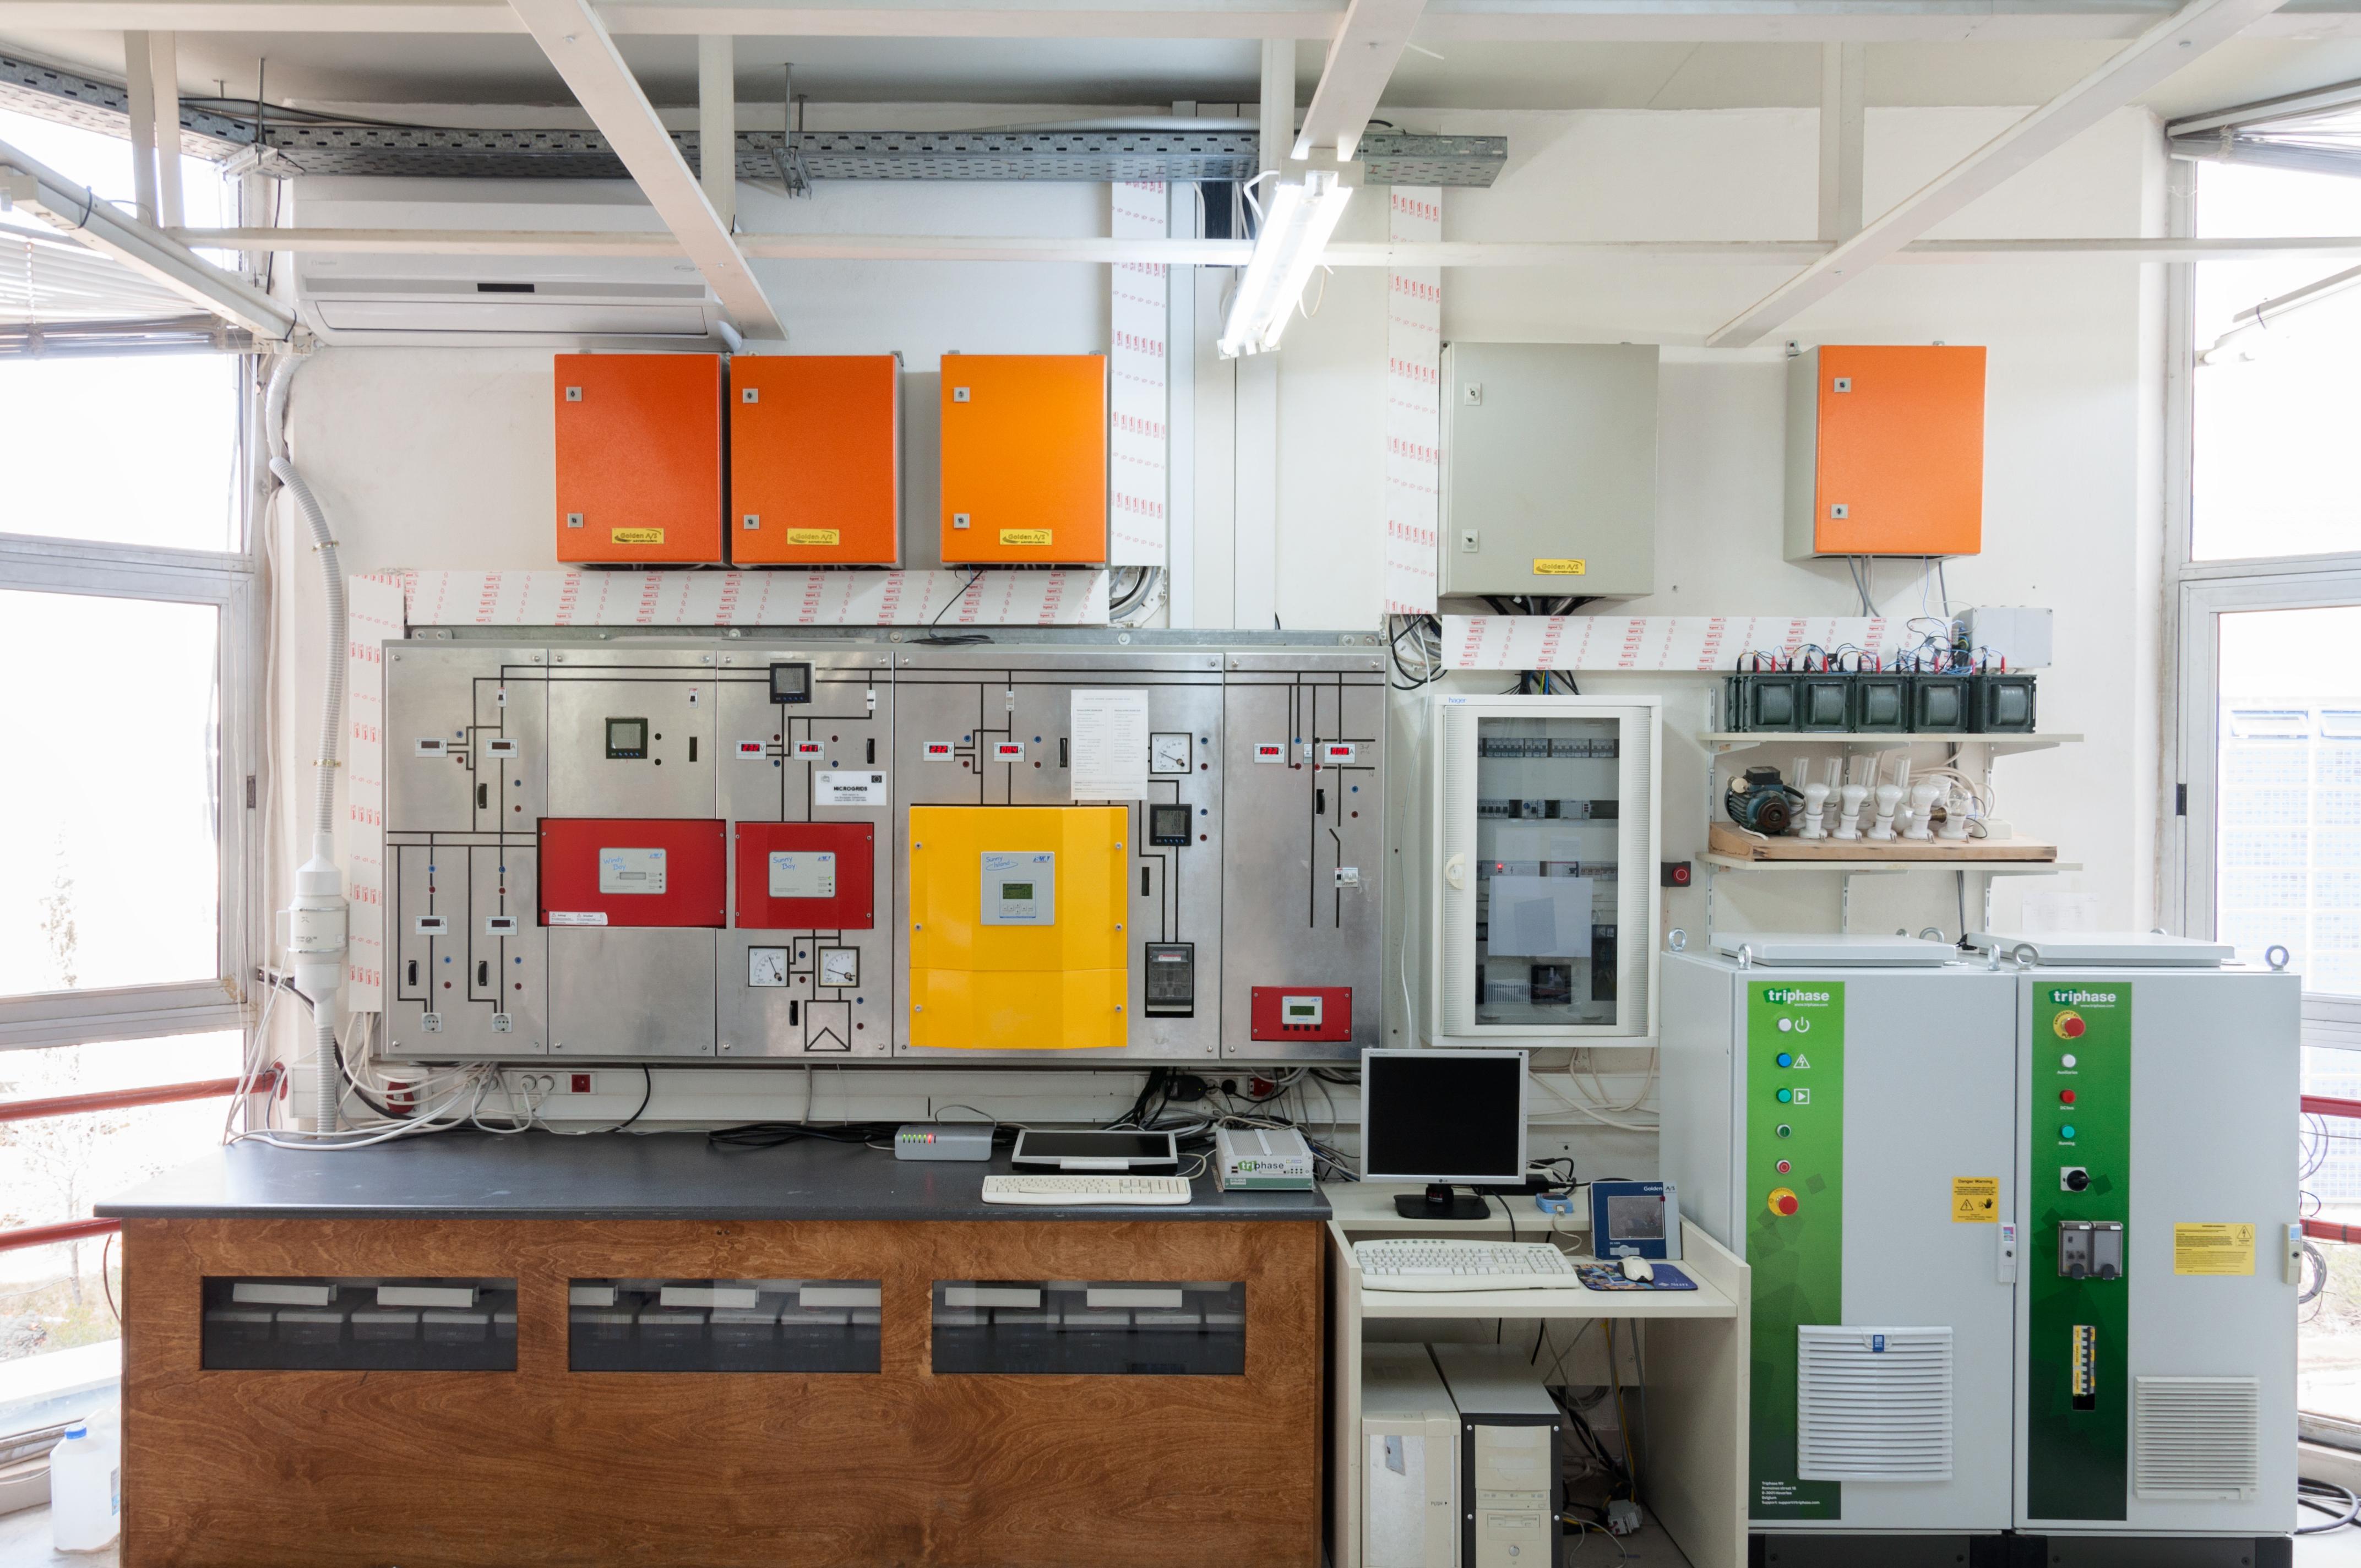 Laboratory-microgrid-of-ICCS-NTUA